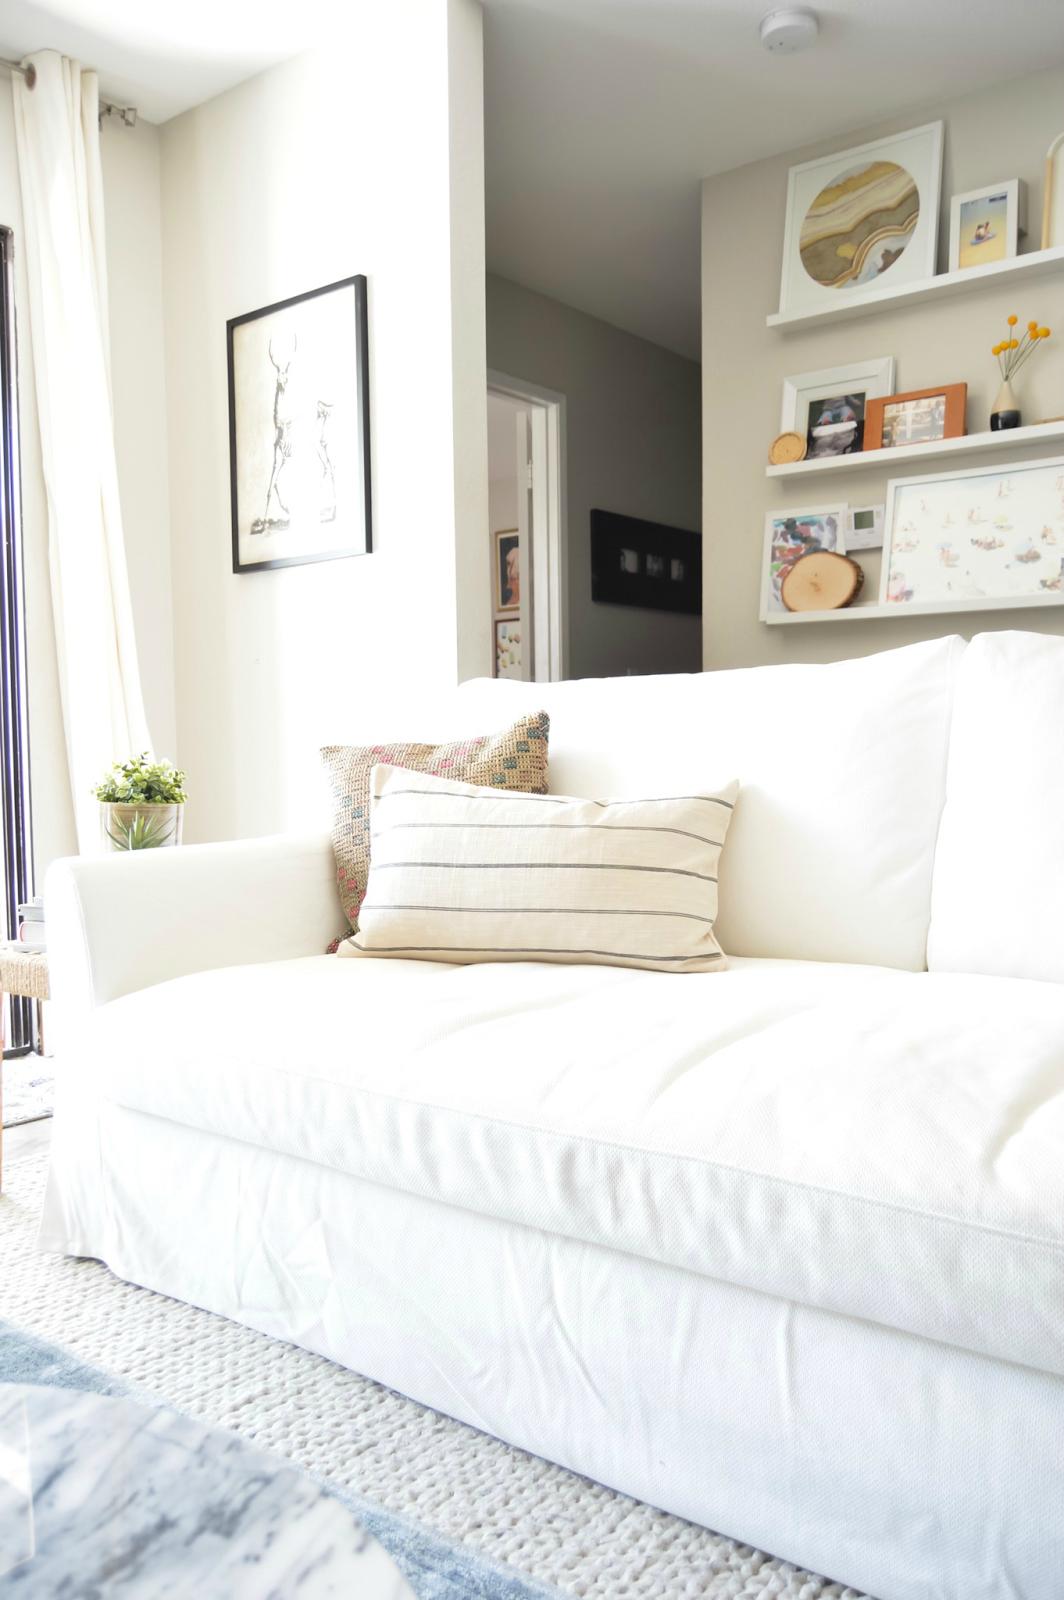 Sofa cover for ikea farlov 3 seat sofa, sofa width 218 cm/85.8 in,ikea slipcover,farlov cover,custom made cover,cotton cover,polyester cover. New sofa {Ikea Farlov}